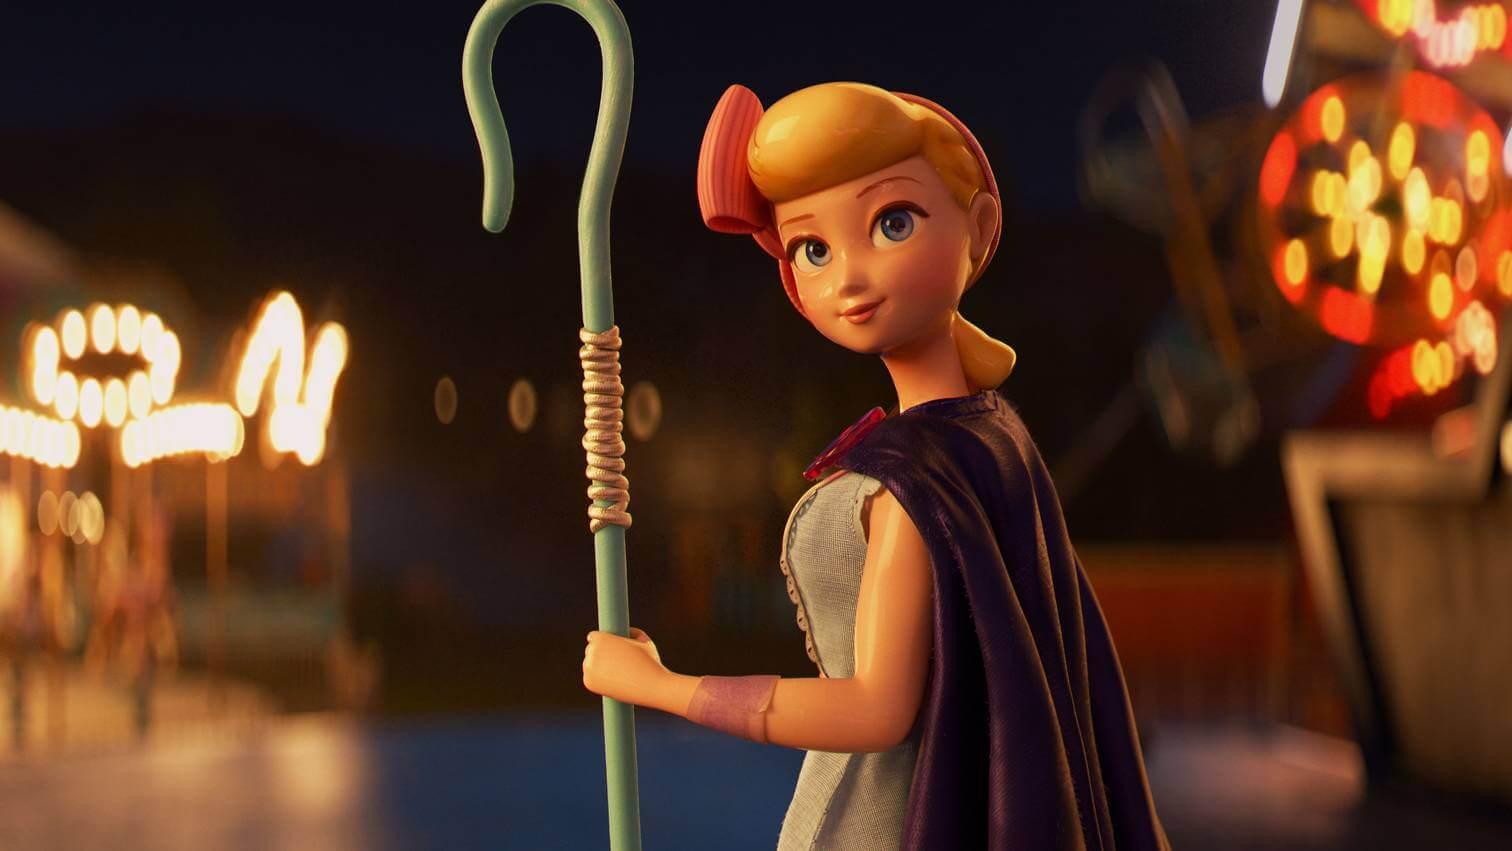 Toy-Story-Little-Bo-Peep